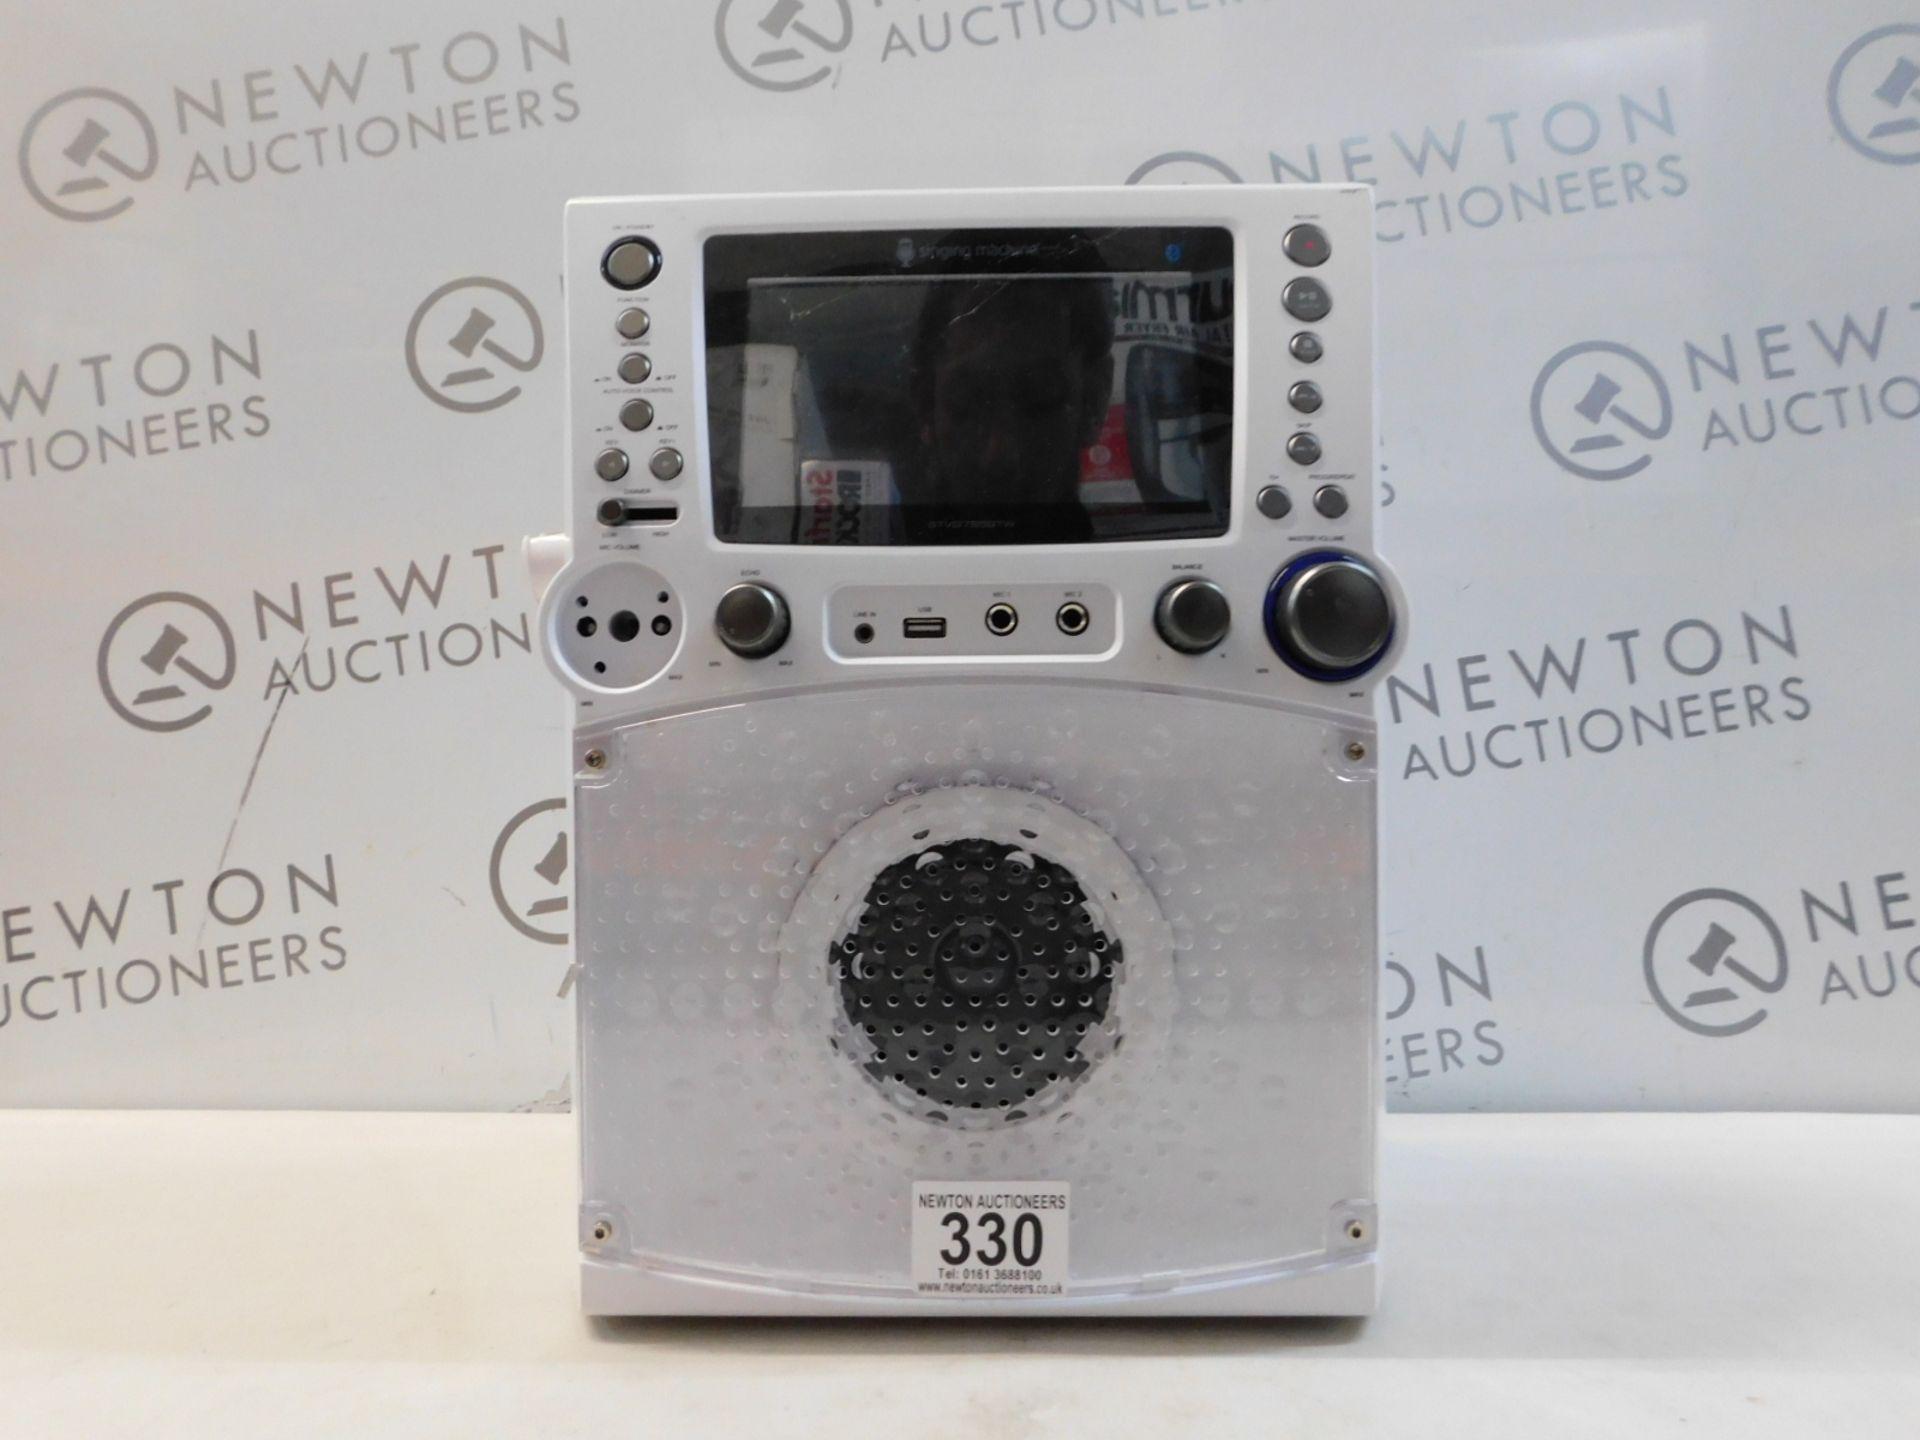 1 SINGING MACHINE STVG785 BLUETOOTH KARAOKE MACHINE WITH DISCO LIGHTS RRP £159